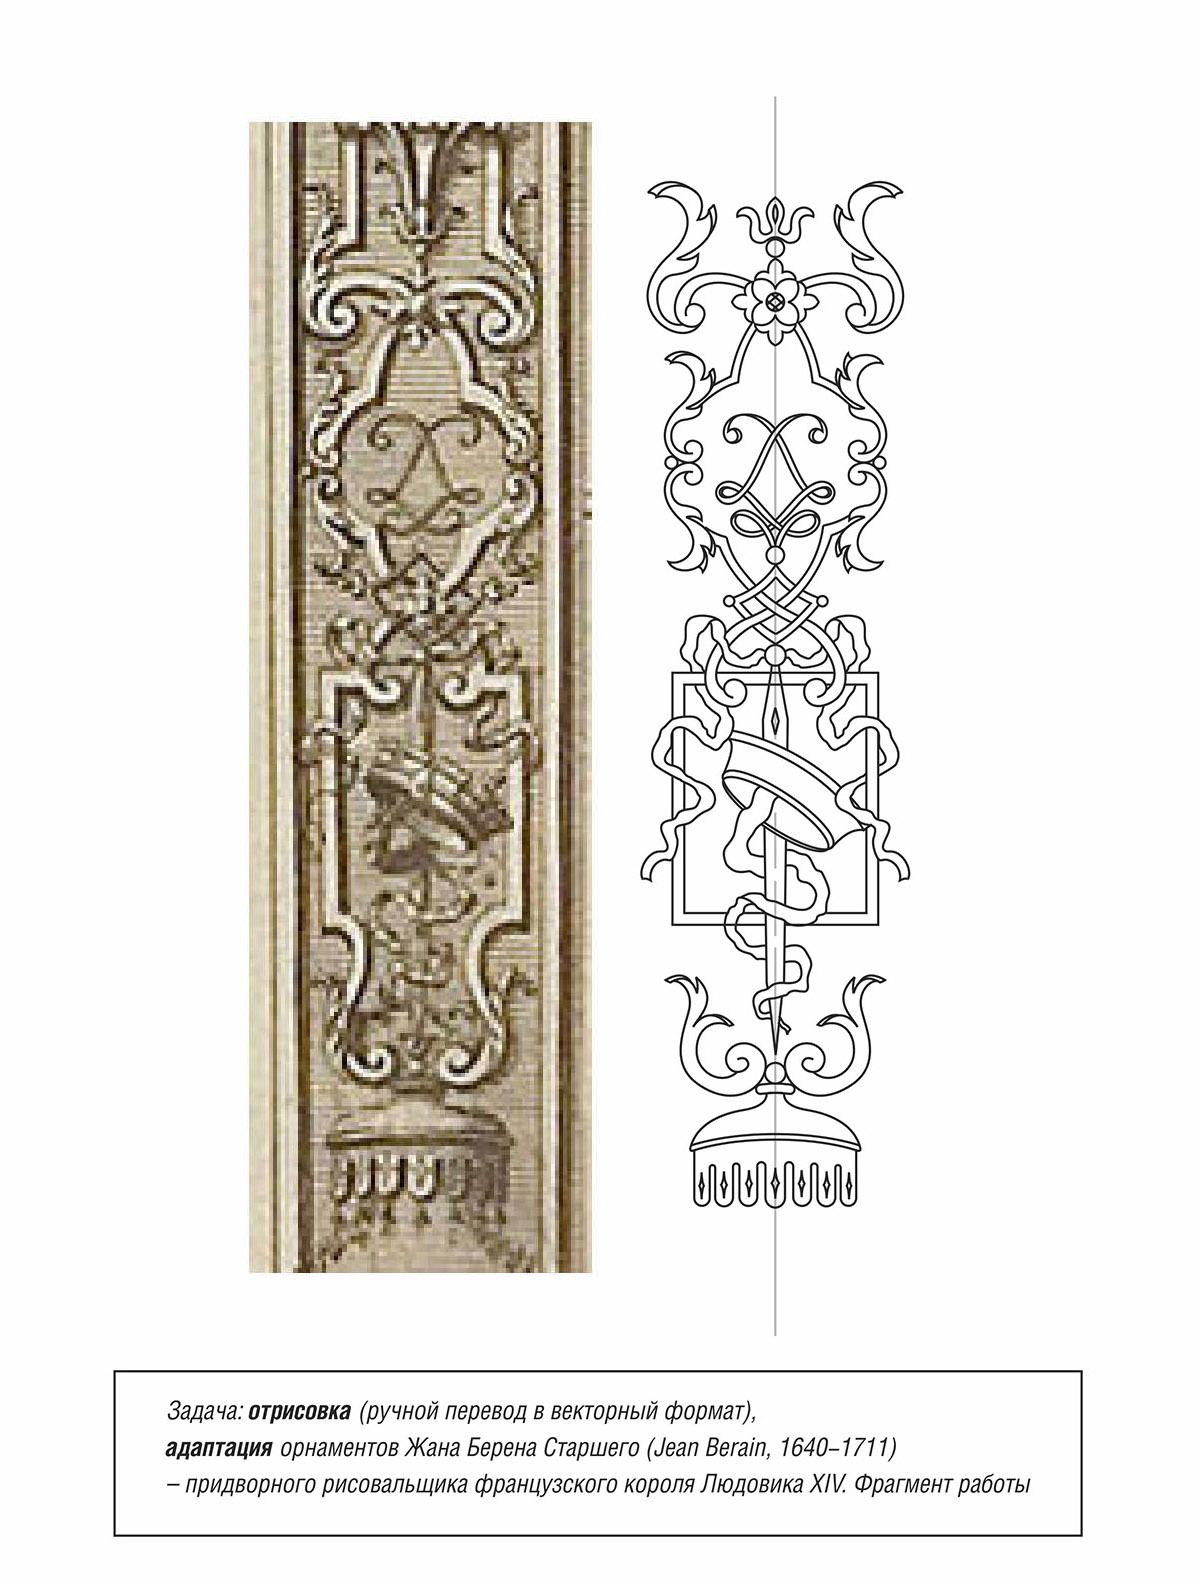 Ручная отрисовка орнамента в векторе